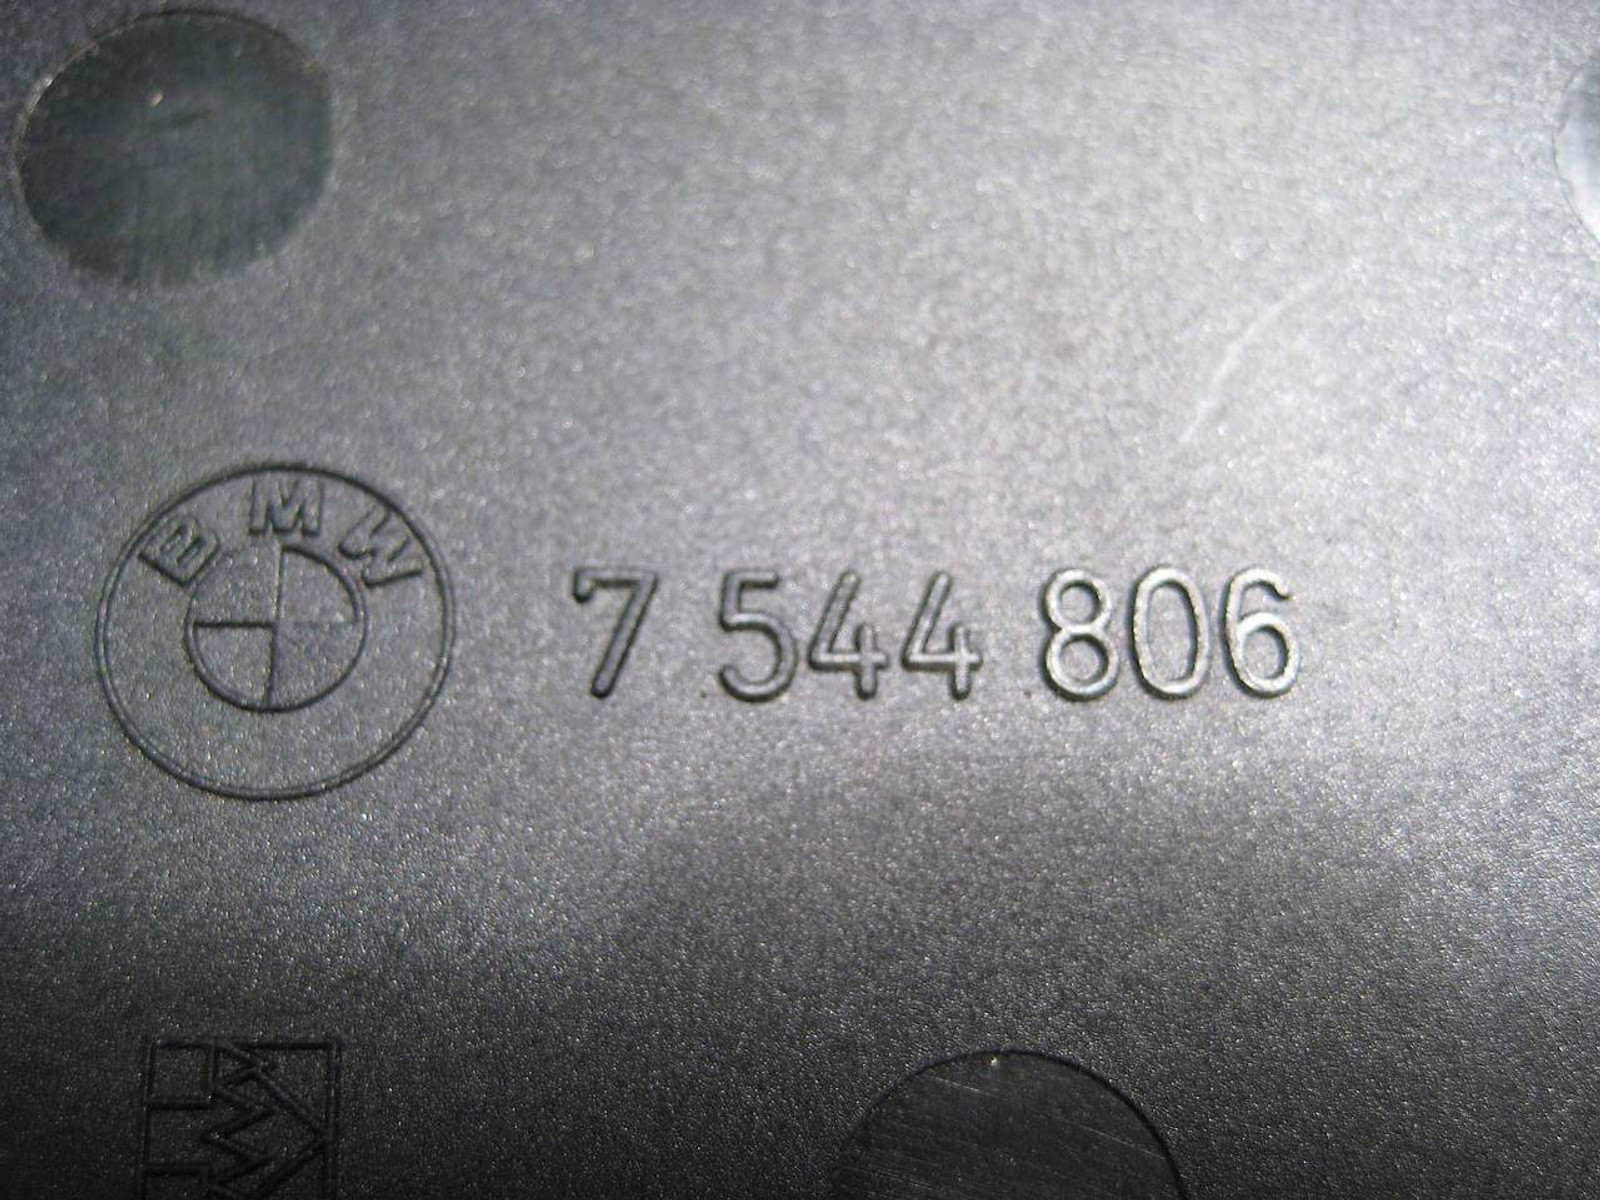 BMW M54 Intake Manifold DISA Valve 2000-2006 OEM USED E39 E46 E60 E85 Z4 X3 Z3